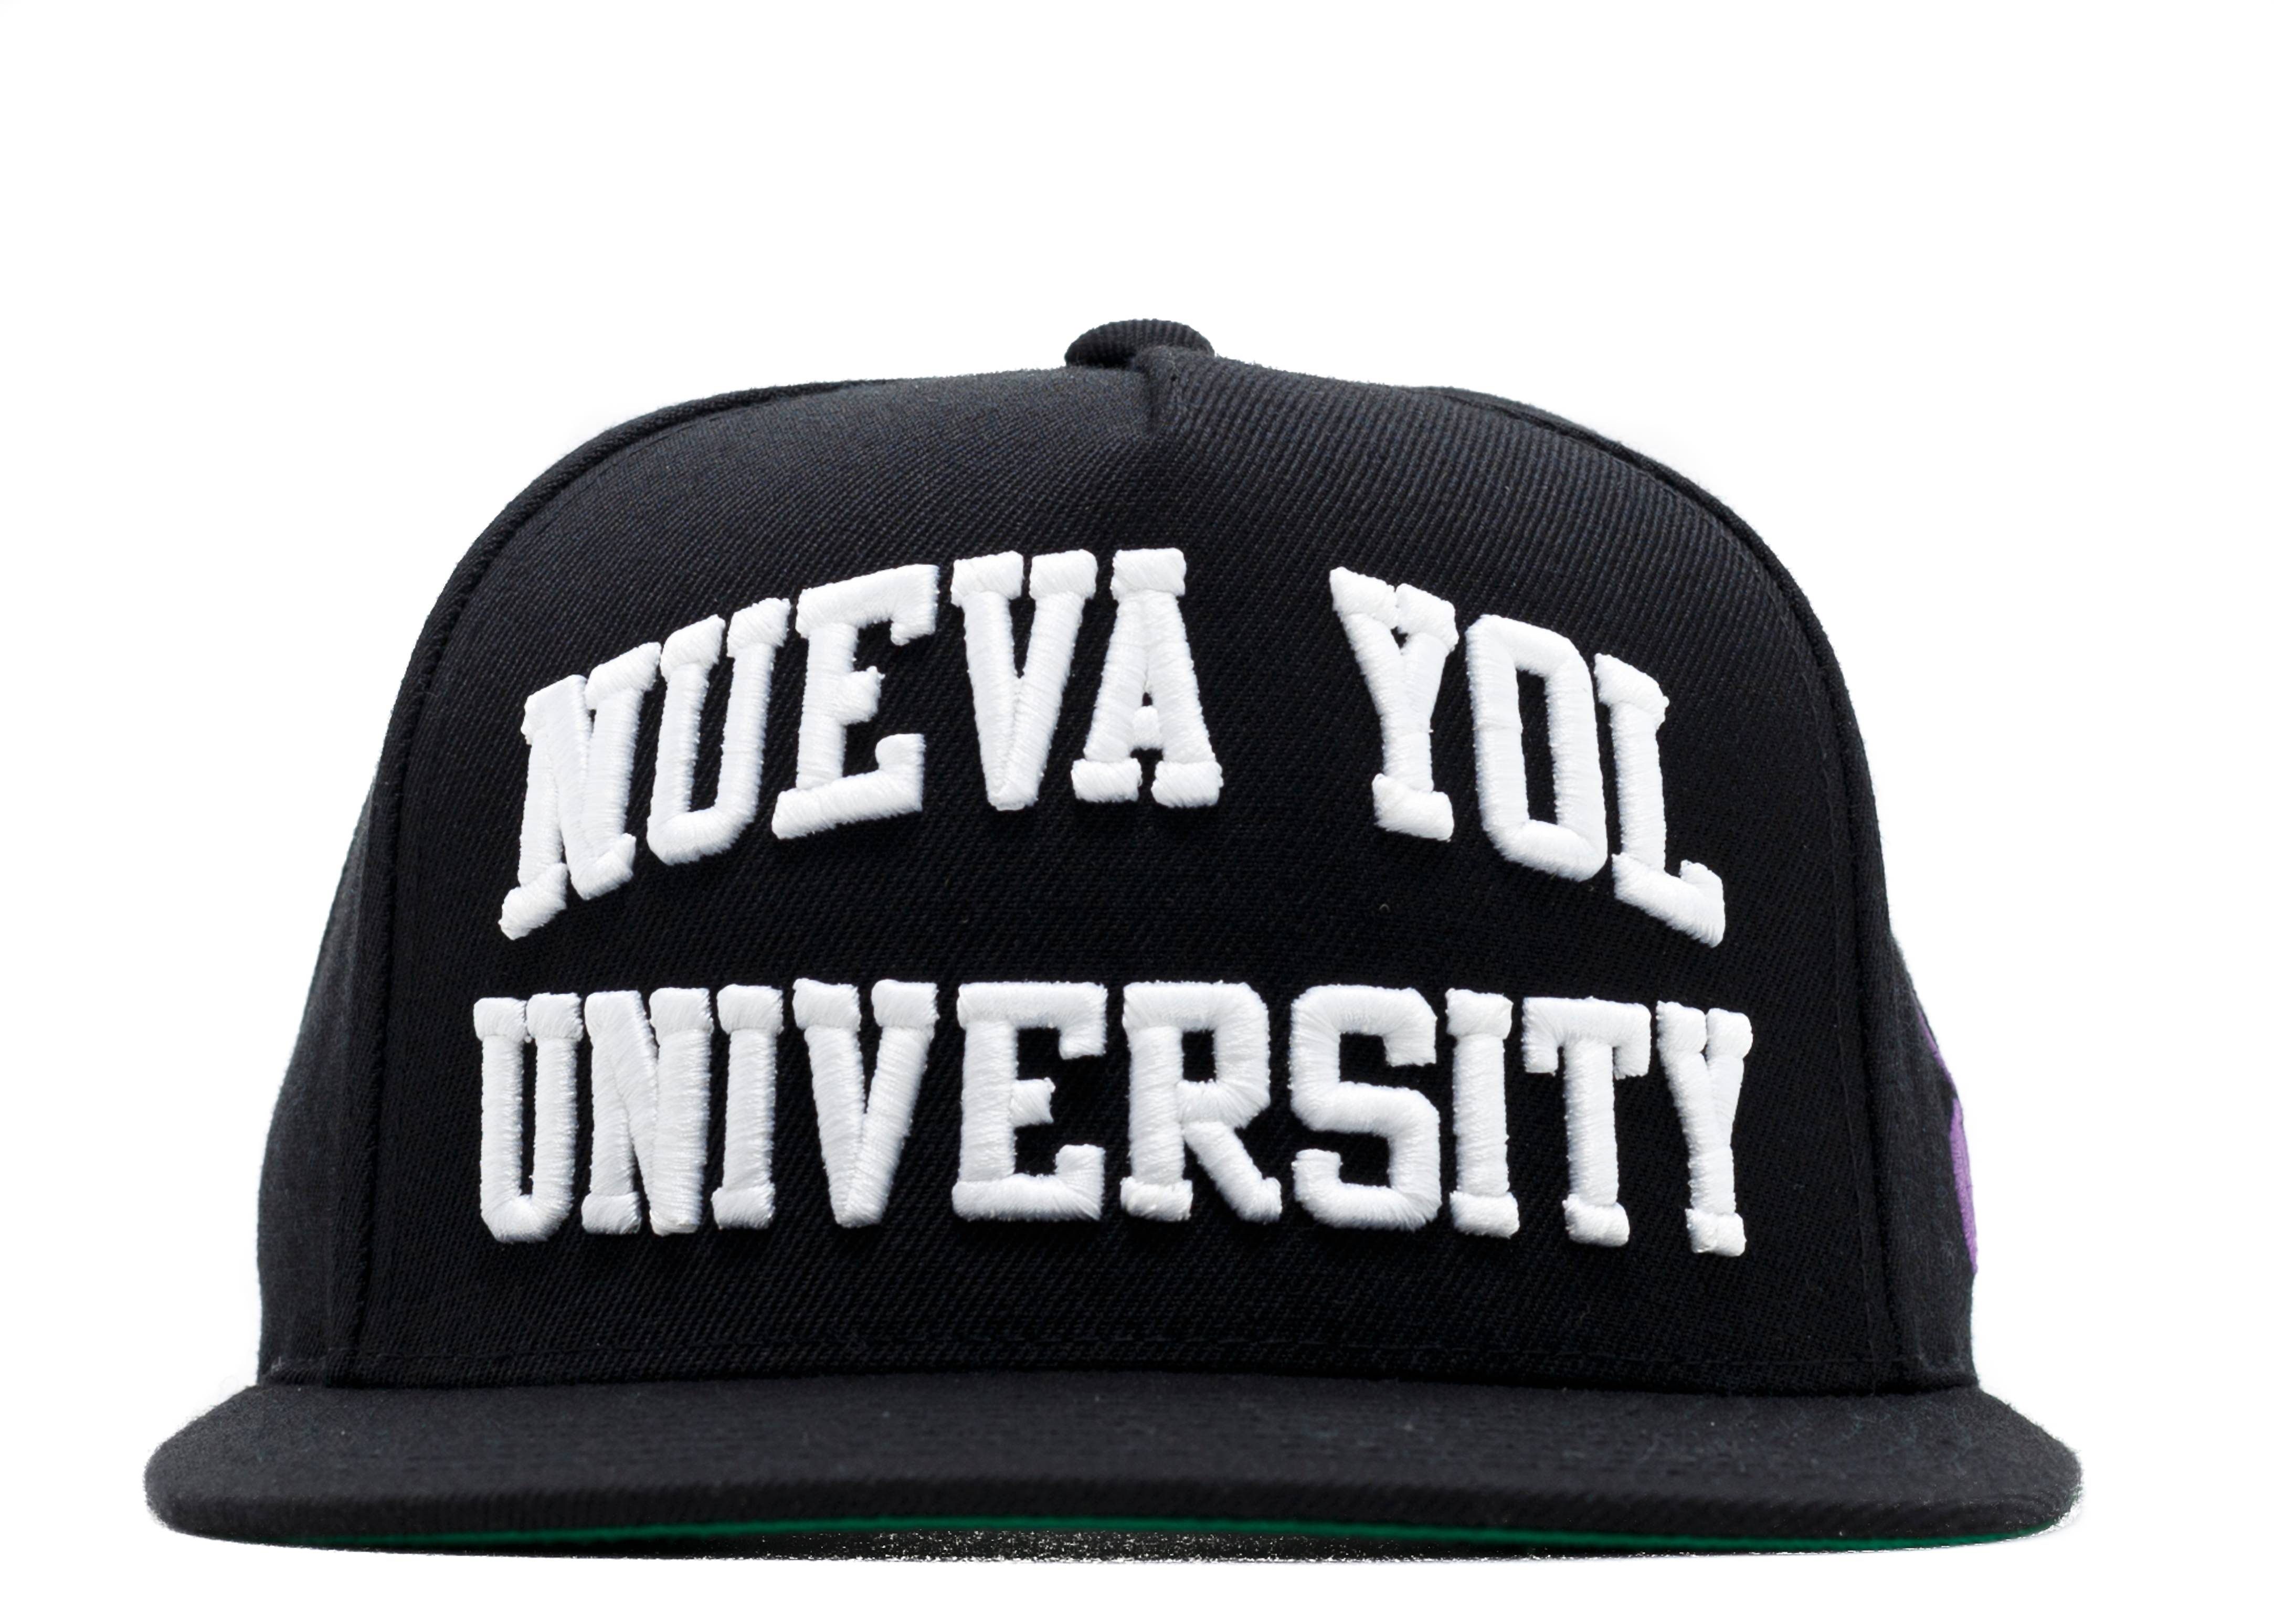 nueva yol university snap-back